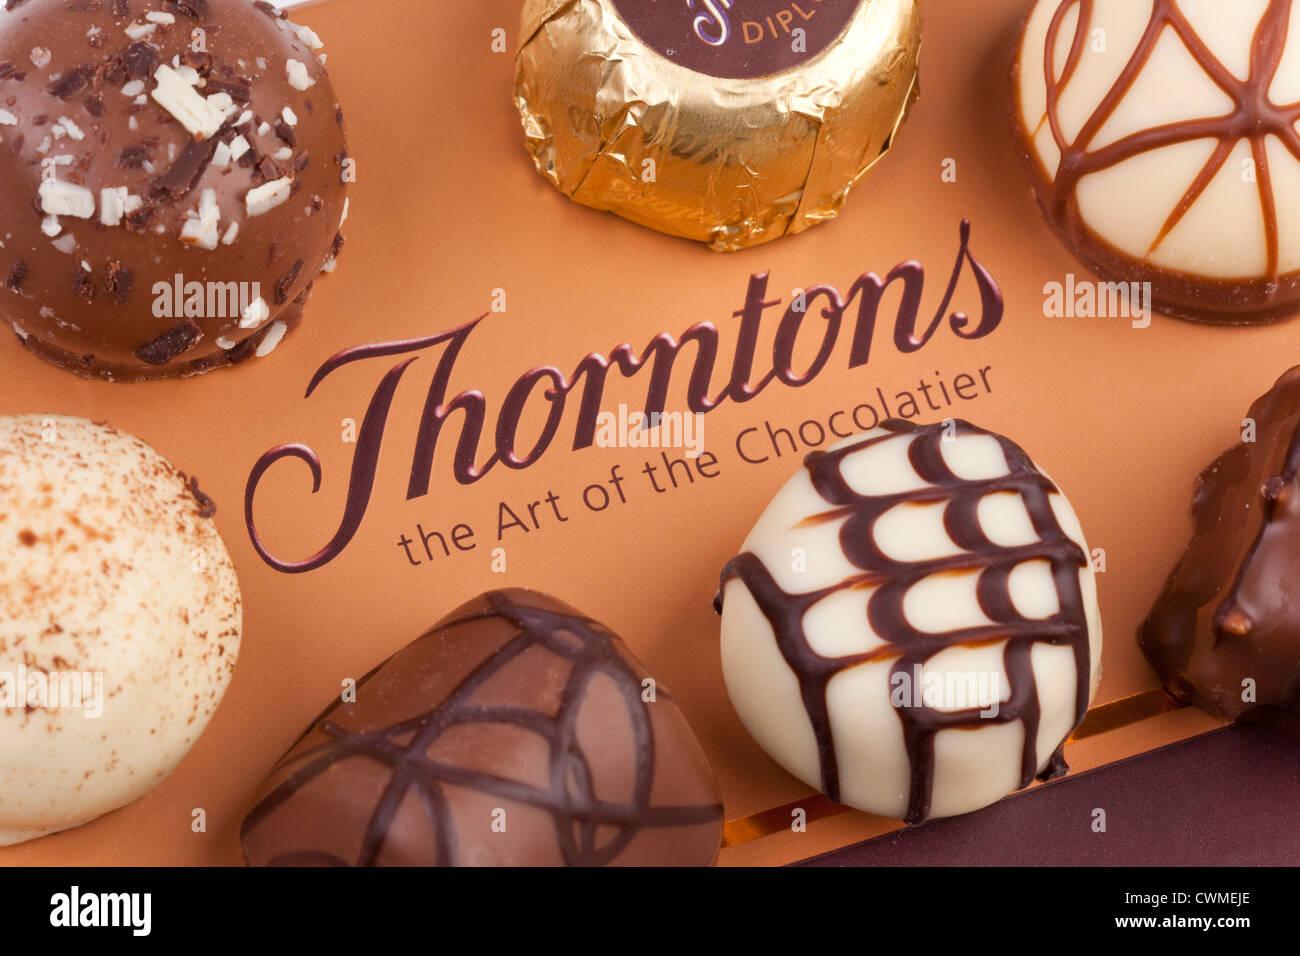 Thorntons chocolates - Stock Image